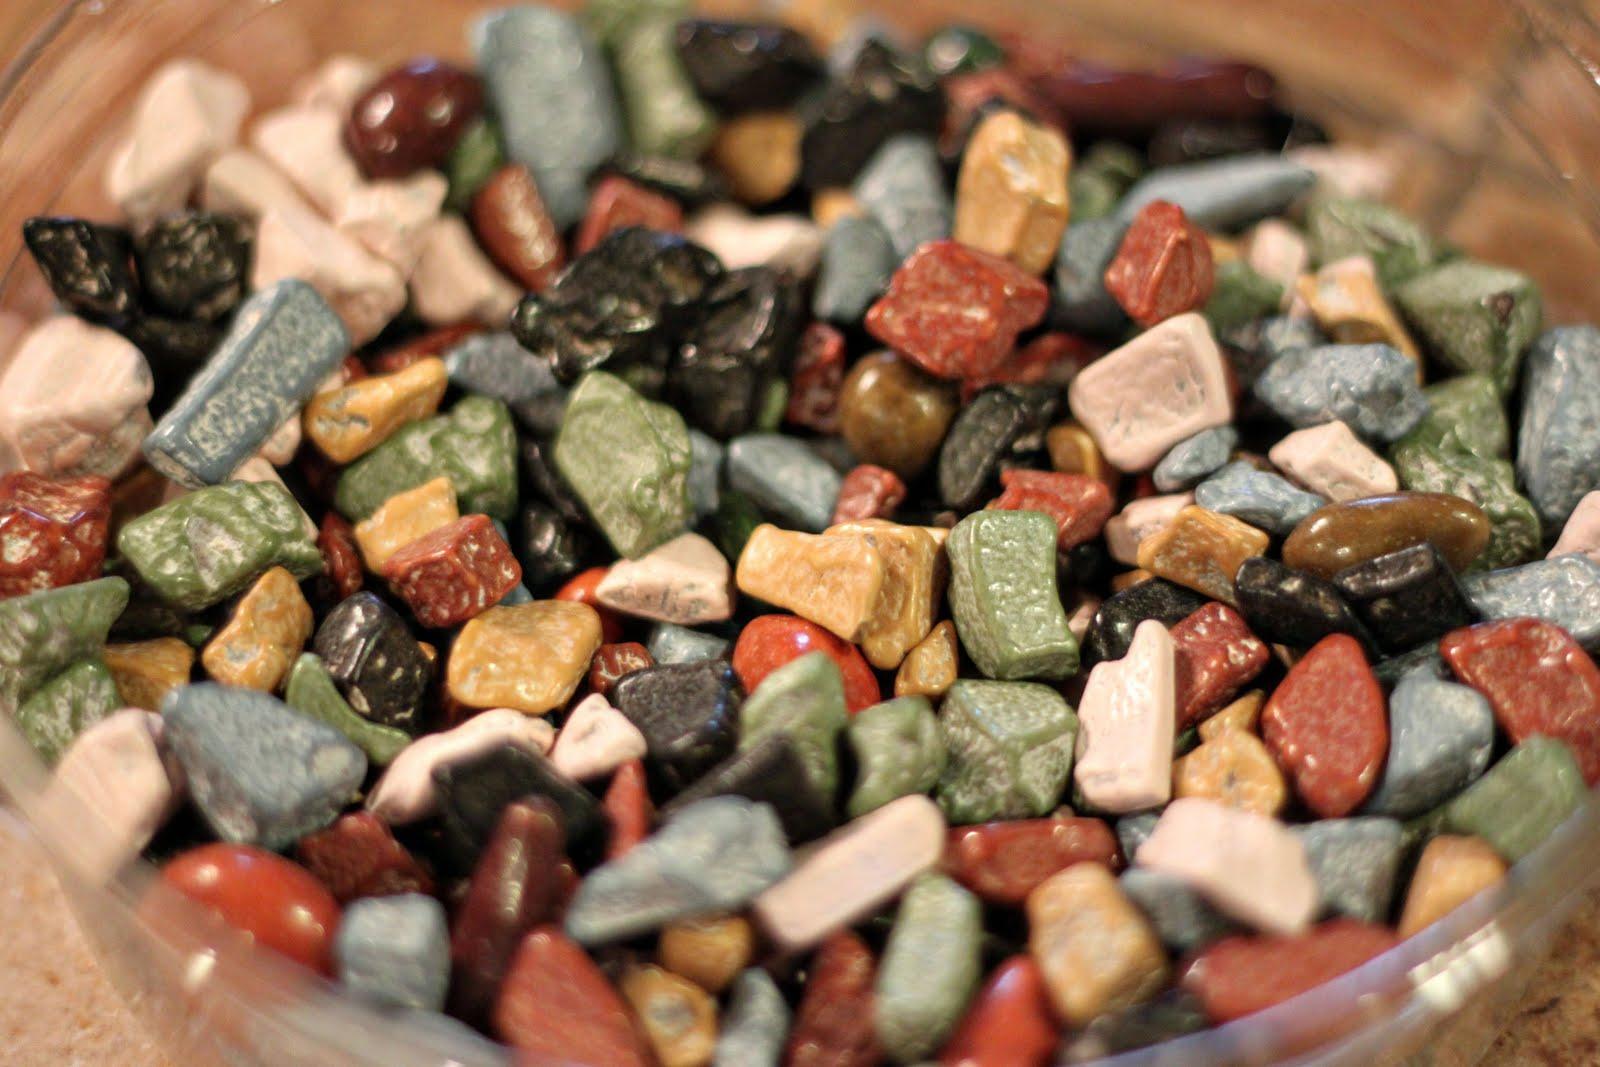 The Good Life: Cream Puffs and Chocolate Rocks